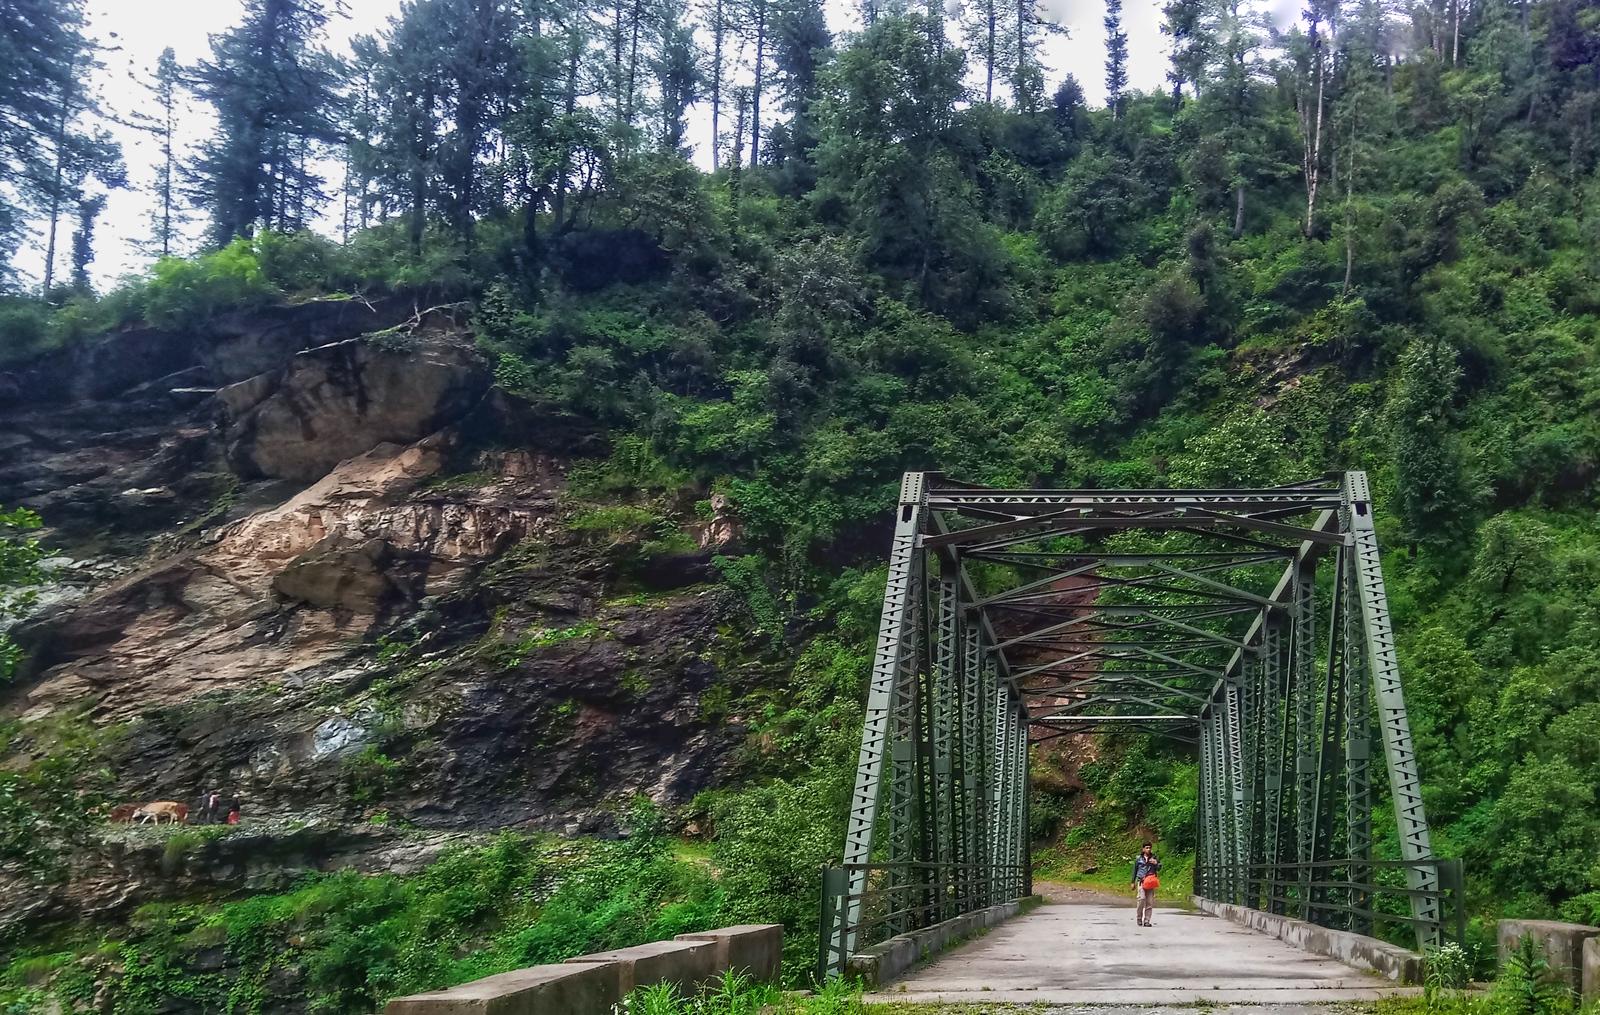 A bridge near the village Dwari, ahead of Raithal in the Garhwal Himalayas of Uttarakhand